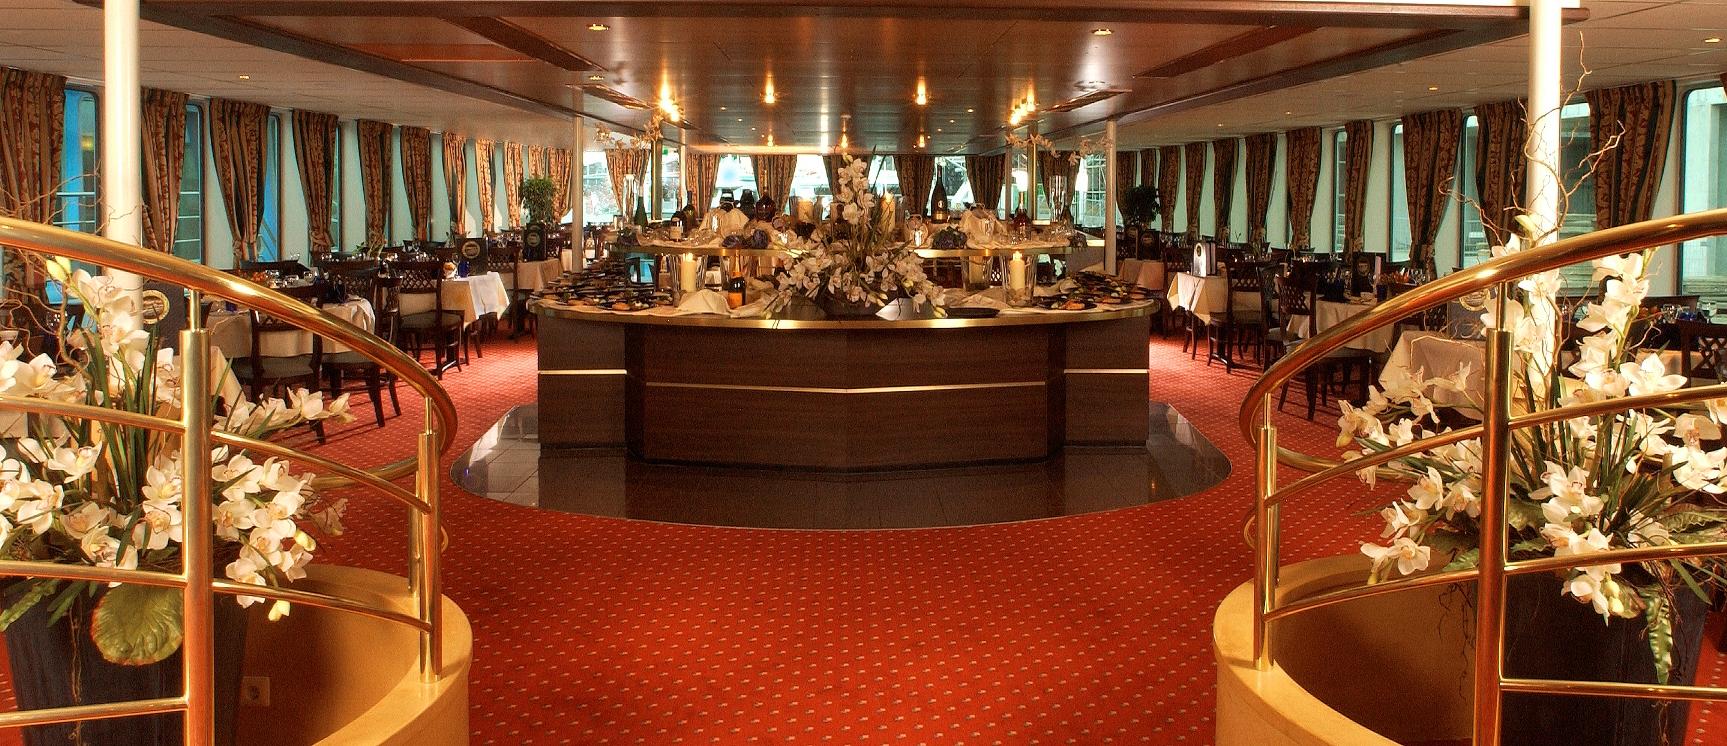 Amadeus River Cruises Amadeus Royal Interior Restaurant 1.jpg